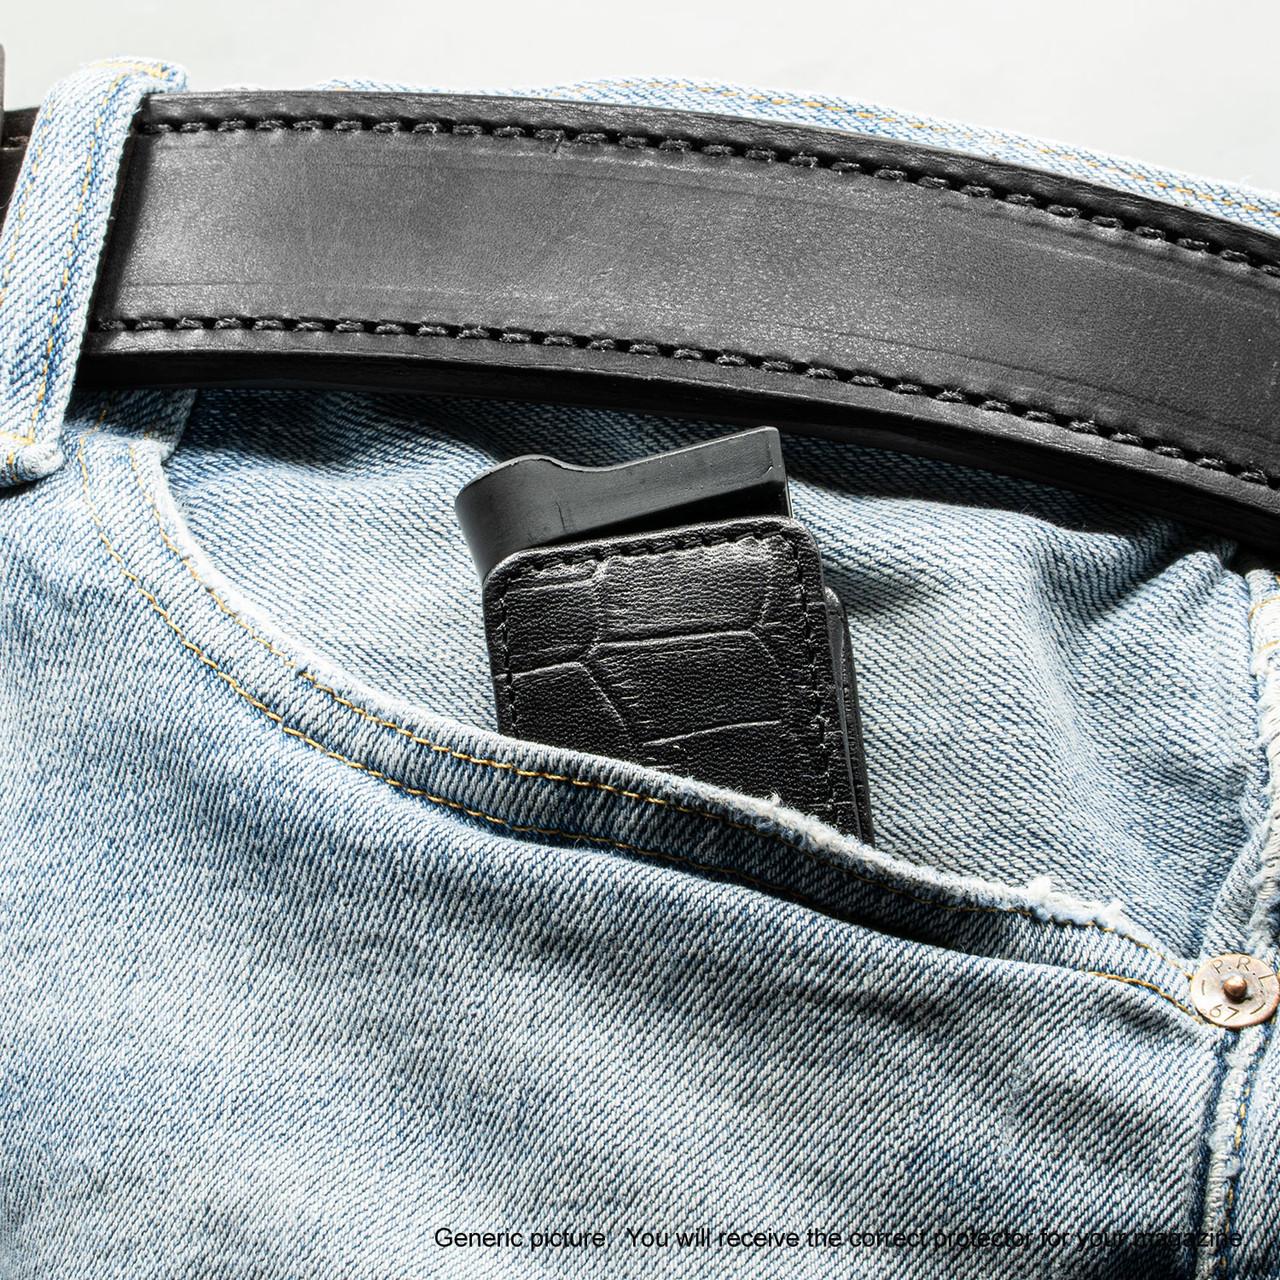 Sig P938 Black Alligator Magazine Pocket Protector